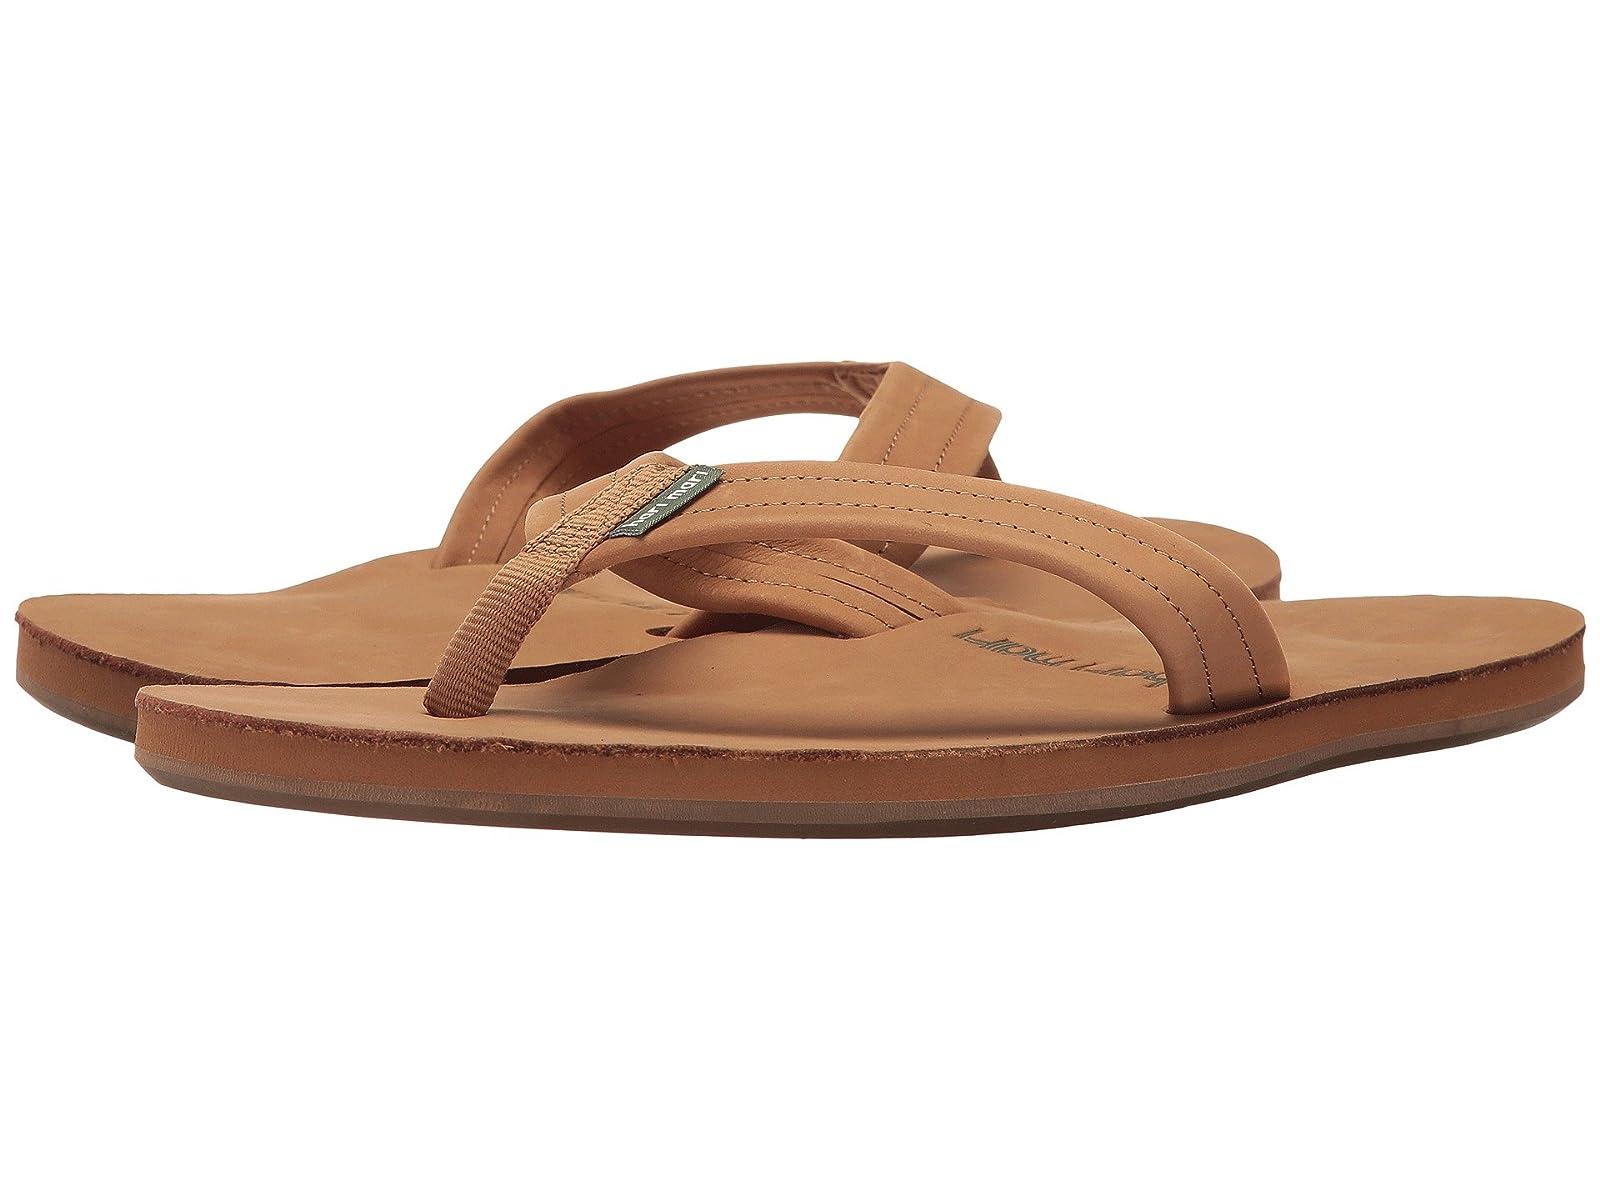 Hari Mari FieldsAtmospheric grades have affordable shoes